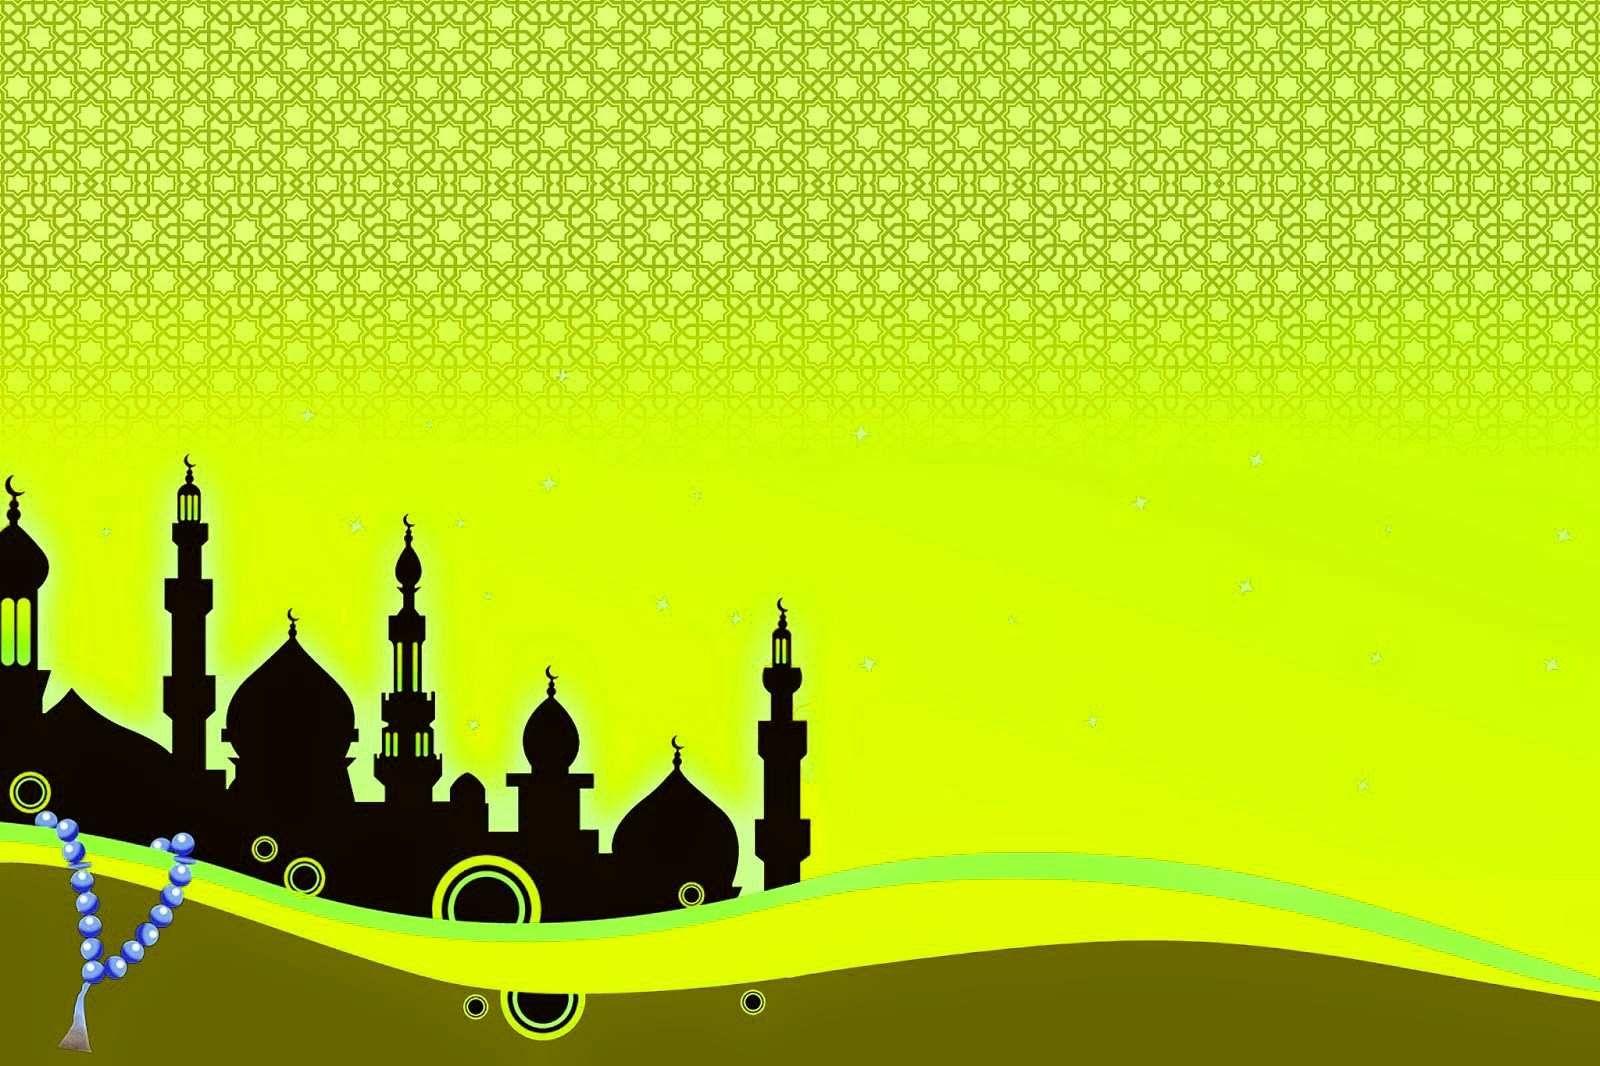 Gambar Kartun Buat Wallpaper Gambar Desain Background Gambar Islami Pas  Buat Banner – Blog Teraktual   Latar Belakang, Seni Gelap, Dinding Gambar